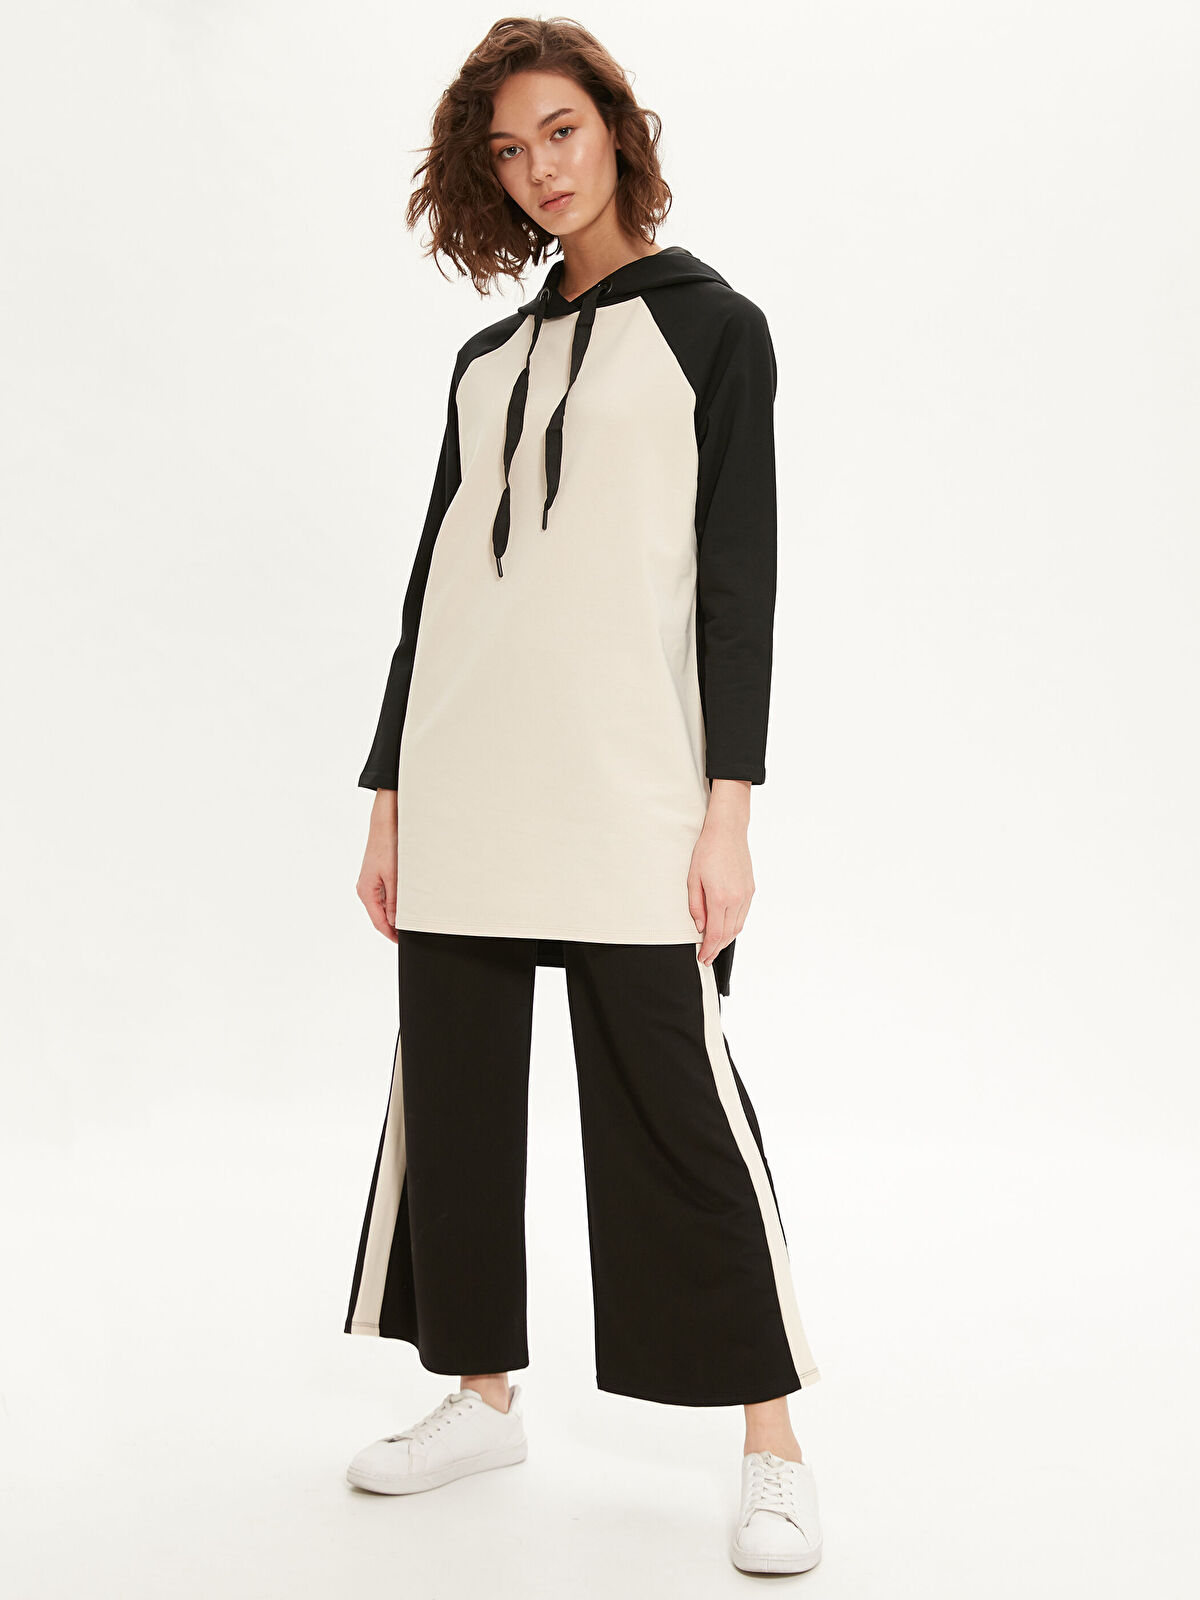 Renk Bloklu Kapüşonlu Uzun Sweatshirt - LC WAIKIKI